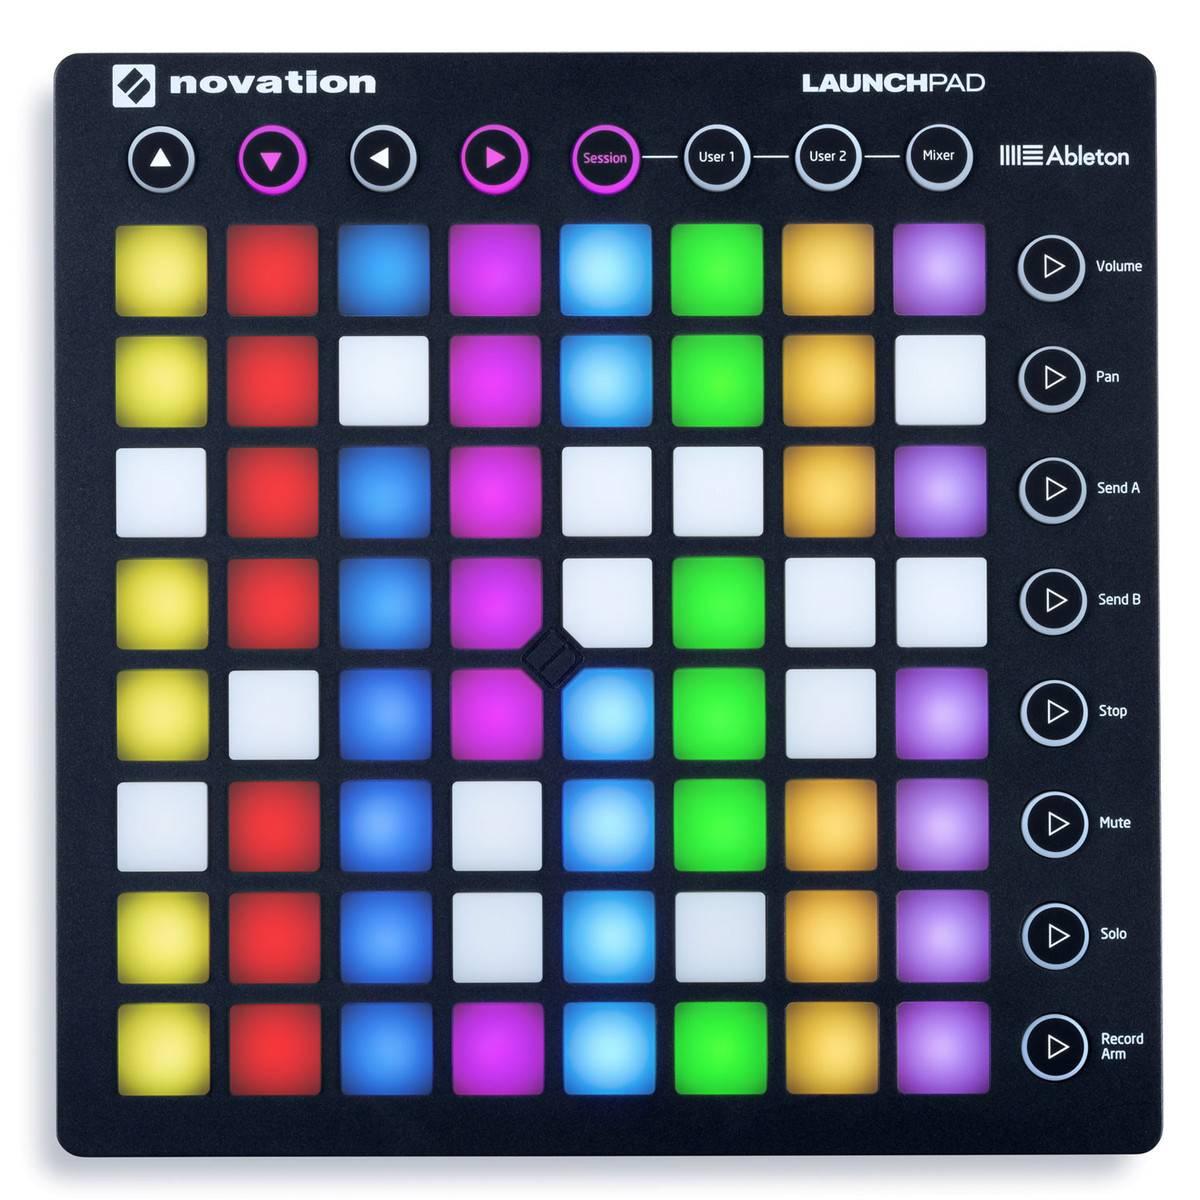 MIDI-контроллер NOVATION LAUNCHPAD MK2, компактный, для Ableton Live, 64 квадратных пэдов, цвет:черный midi контроллер novation launchpad mk2 компактный для ableton live 64 квадратных пэдов цвет черный